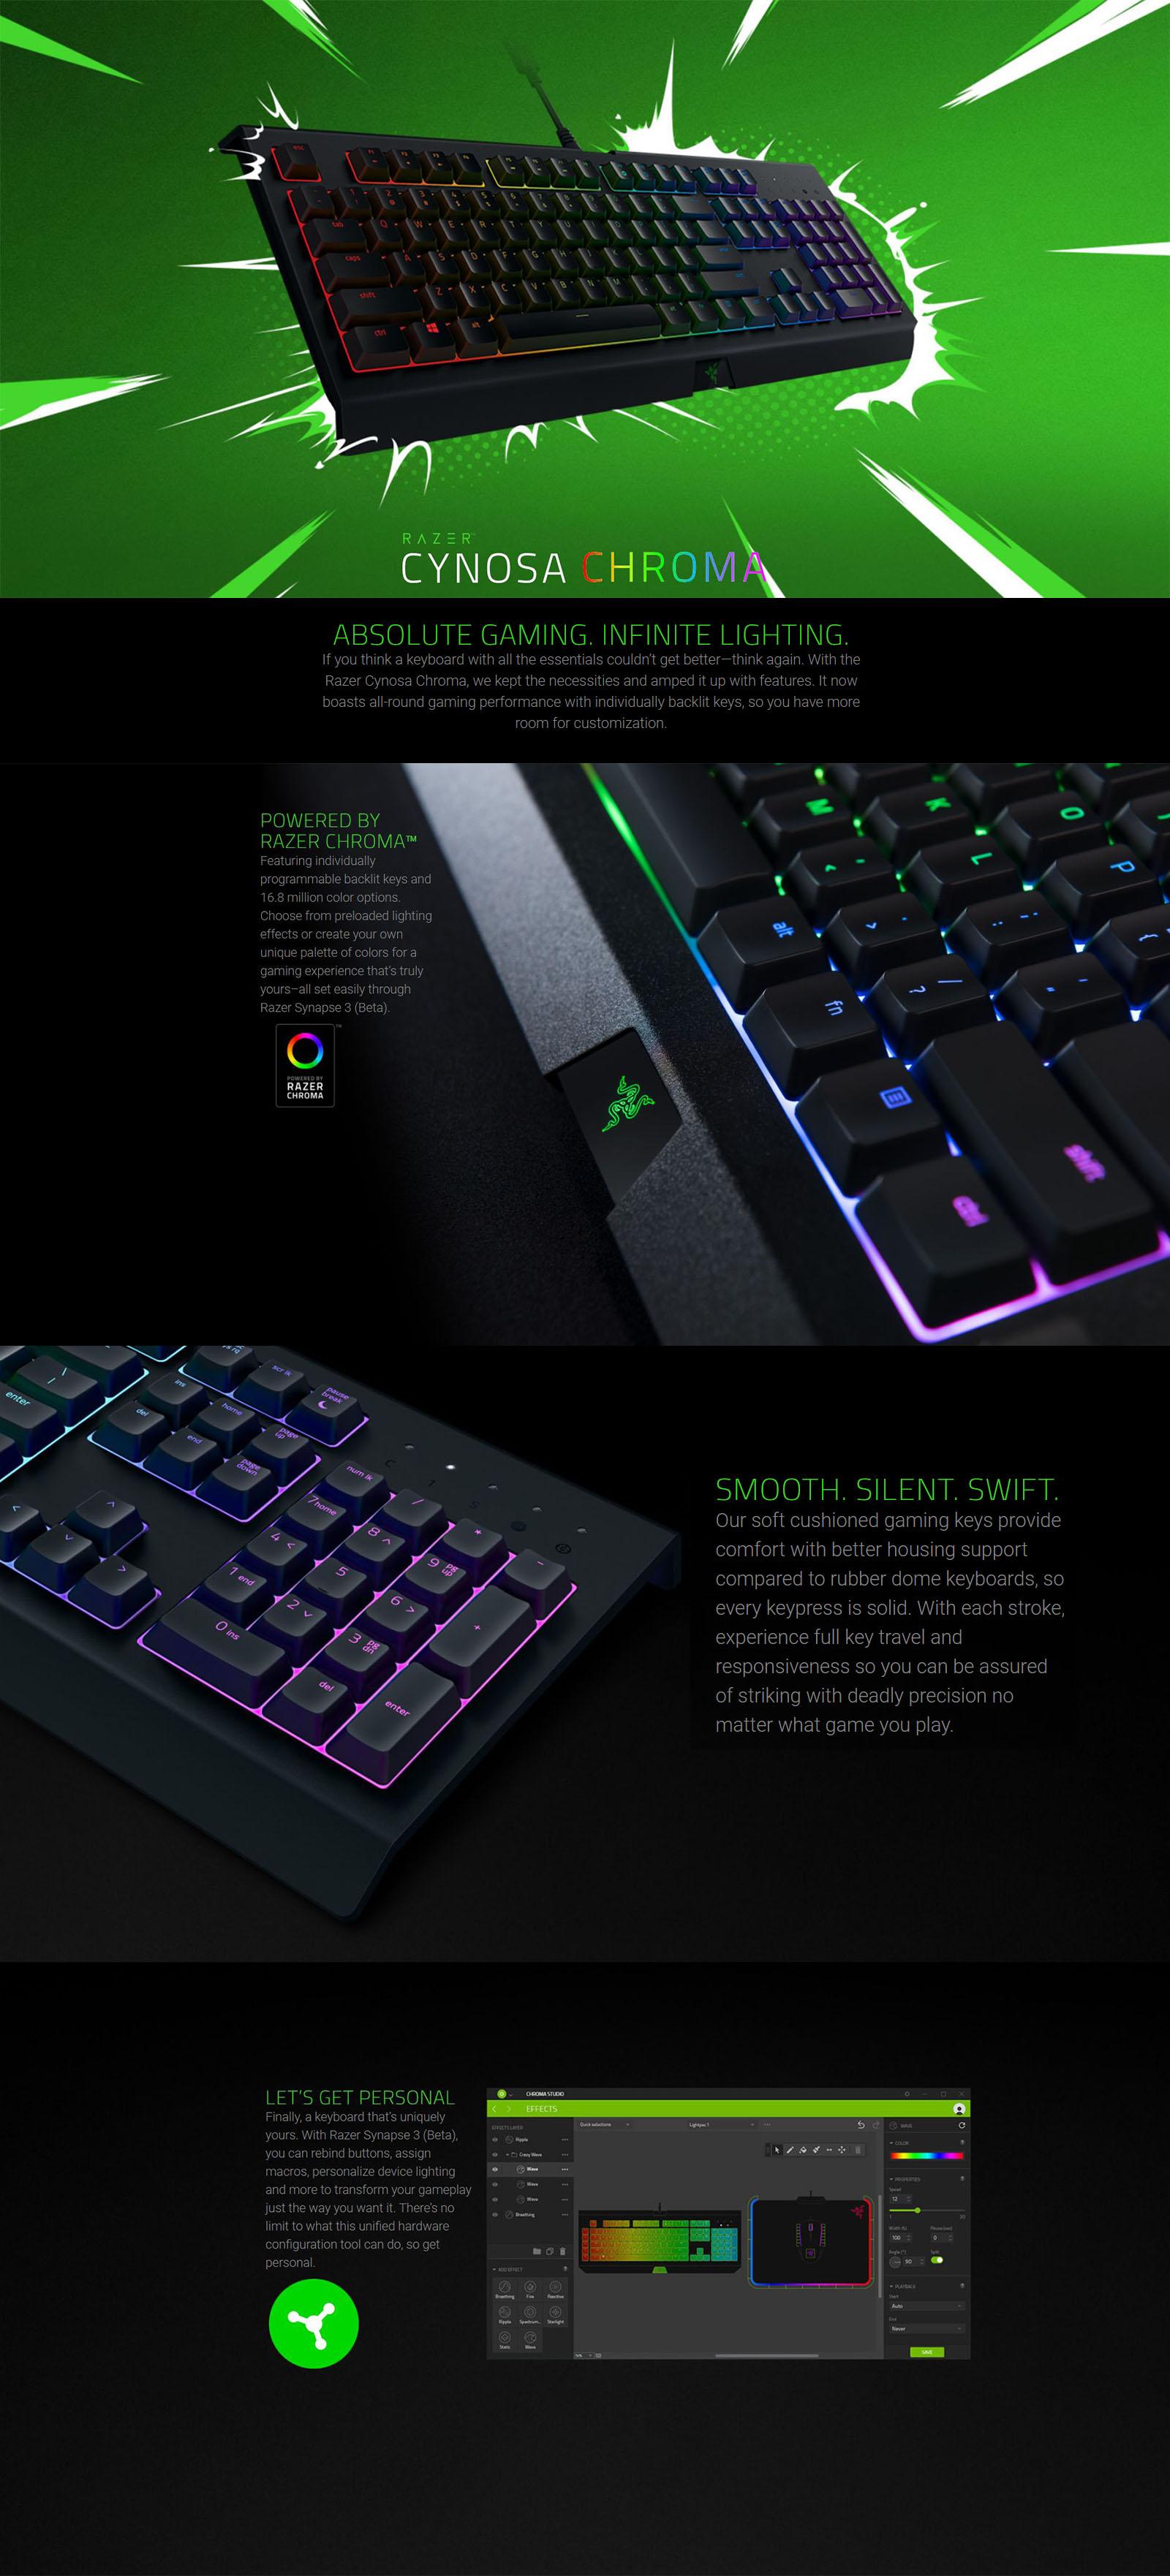 25d0eb9c90b Razer Cynosa Chroma Multi-color Membrane Gaming Keyboard - Umart.com.au